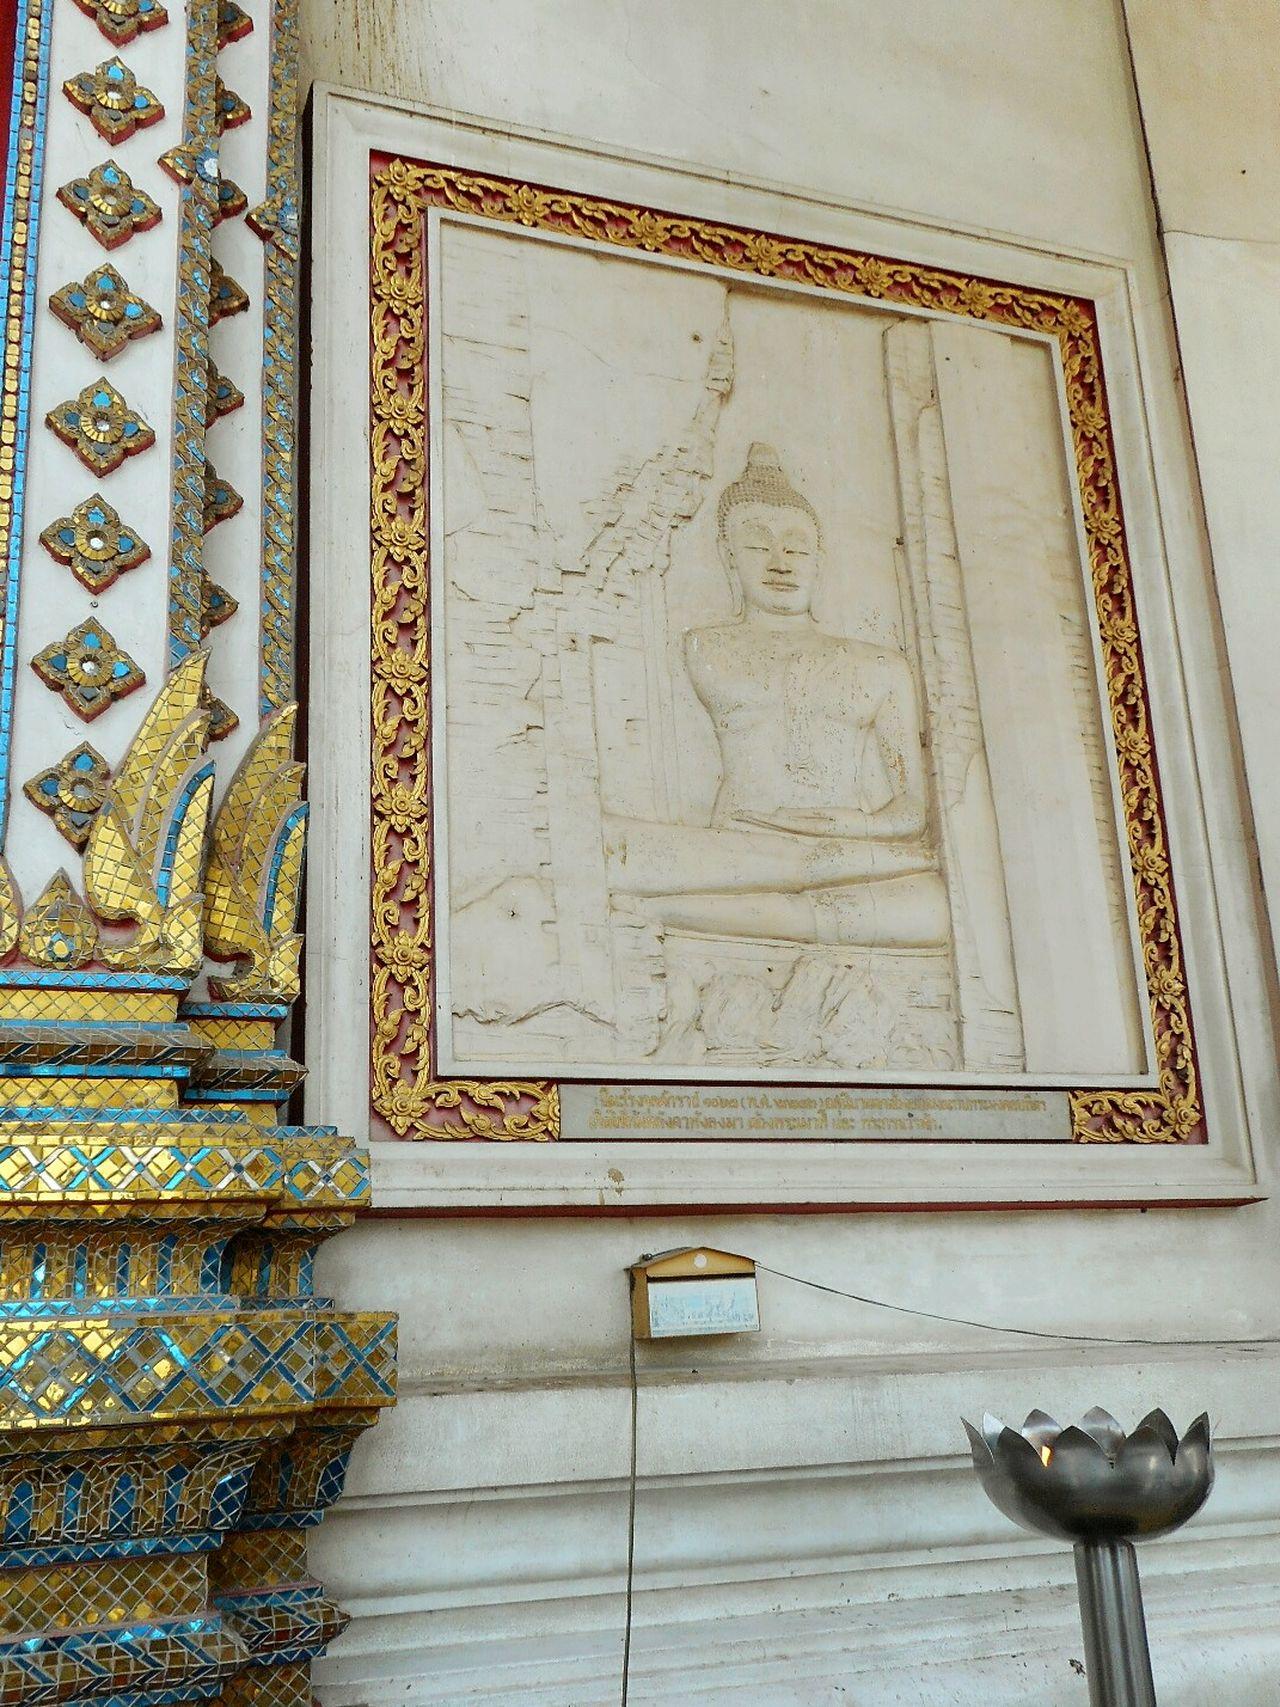 Religion Architecture Budismo Thai Travel Sculpture Idol Buddhist Temple Tailandia Travel Photography Architecture Thailand BangkokThailand Bangkok Buddha Dorado Buddha Statue Gold Colored Buddhist Cultures